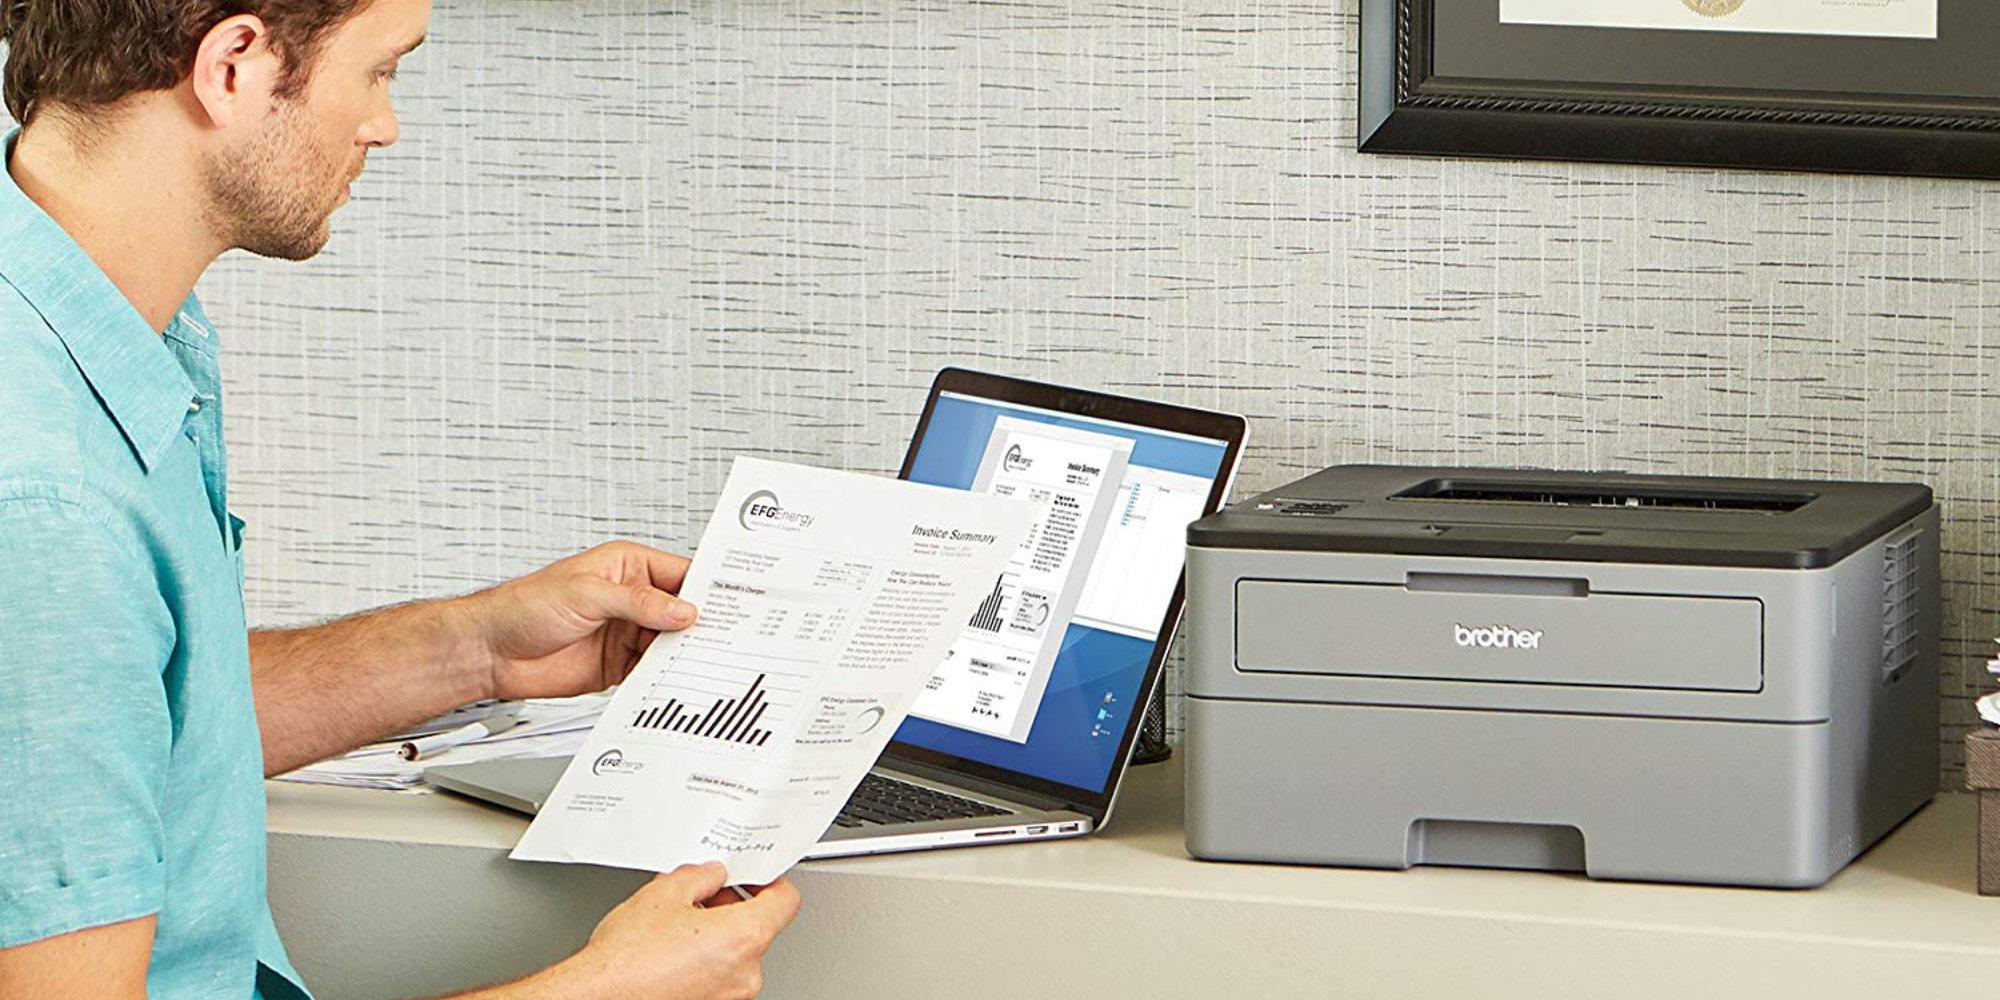 Brother HL-L2350DW: the best monochrome laser printer